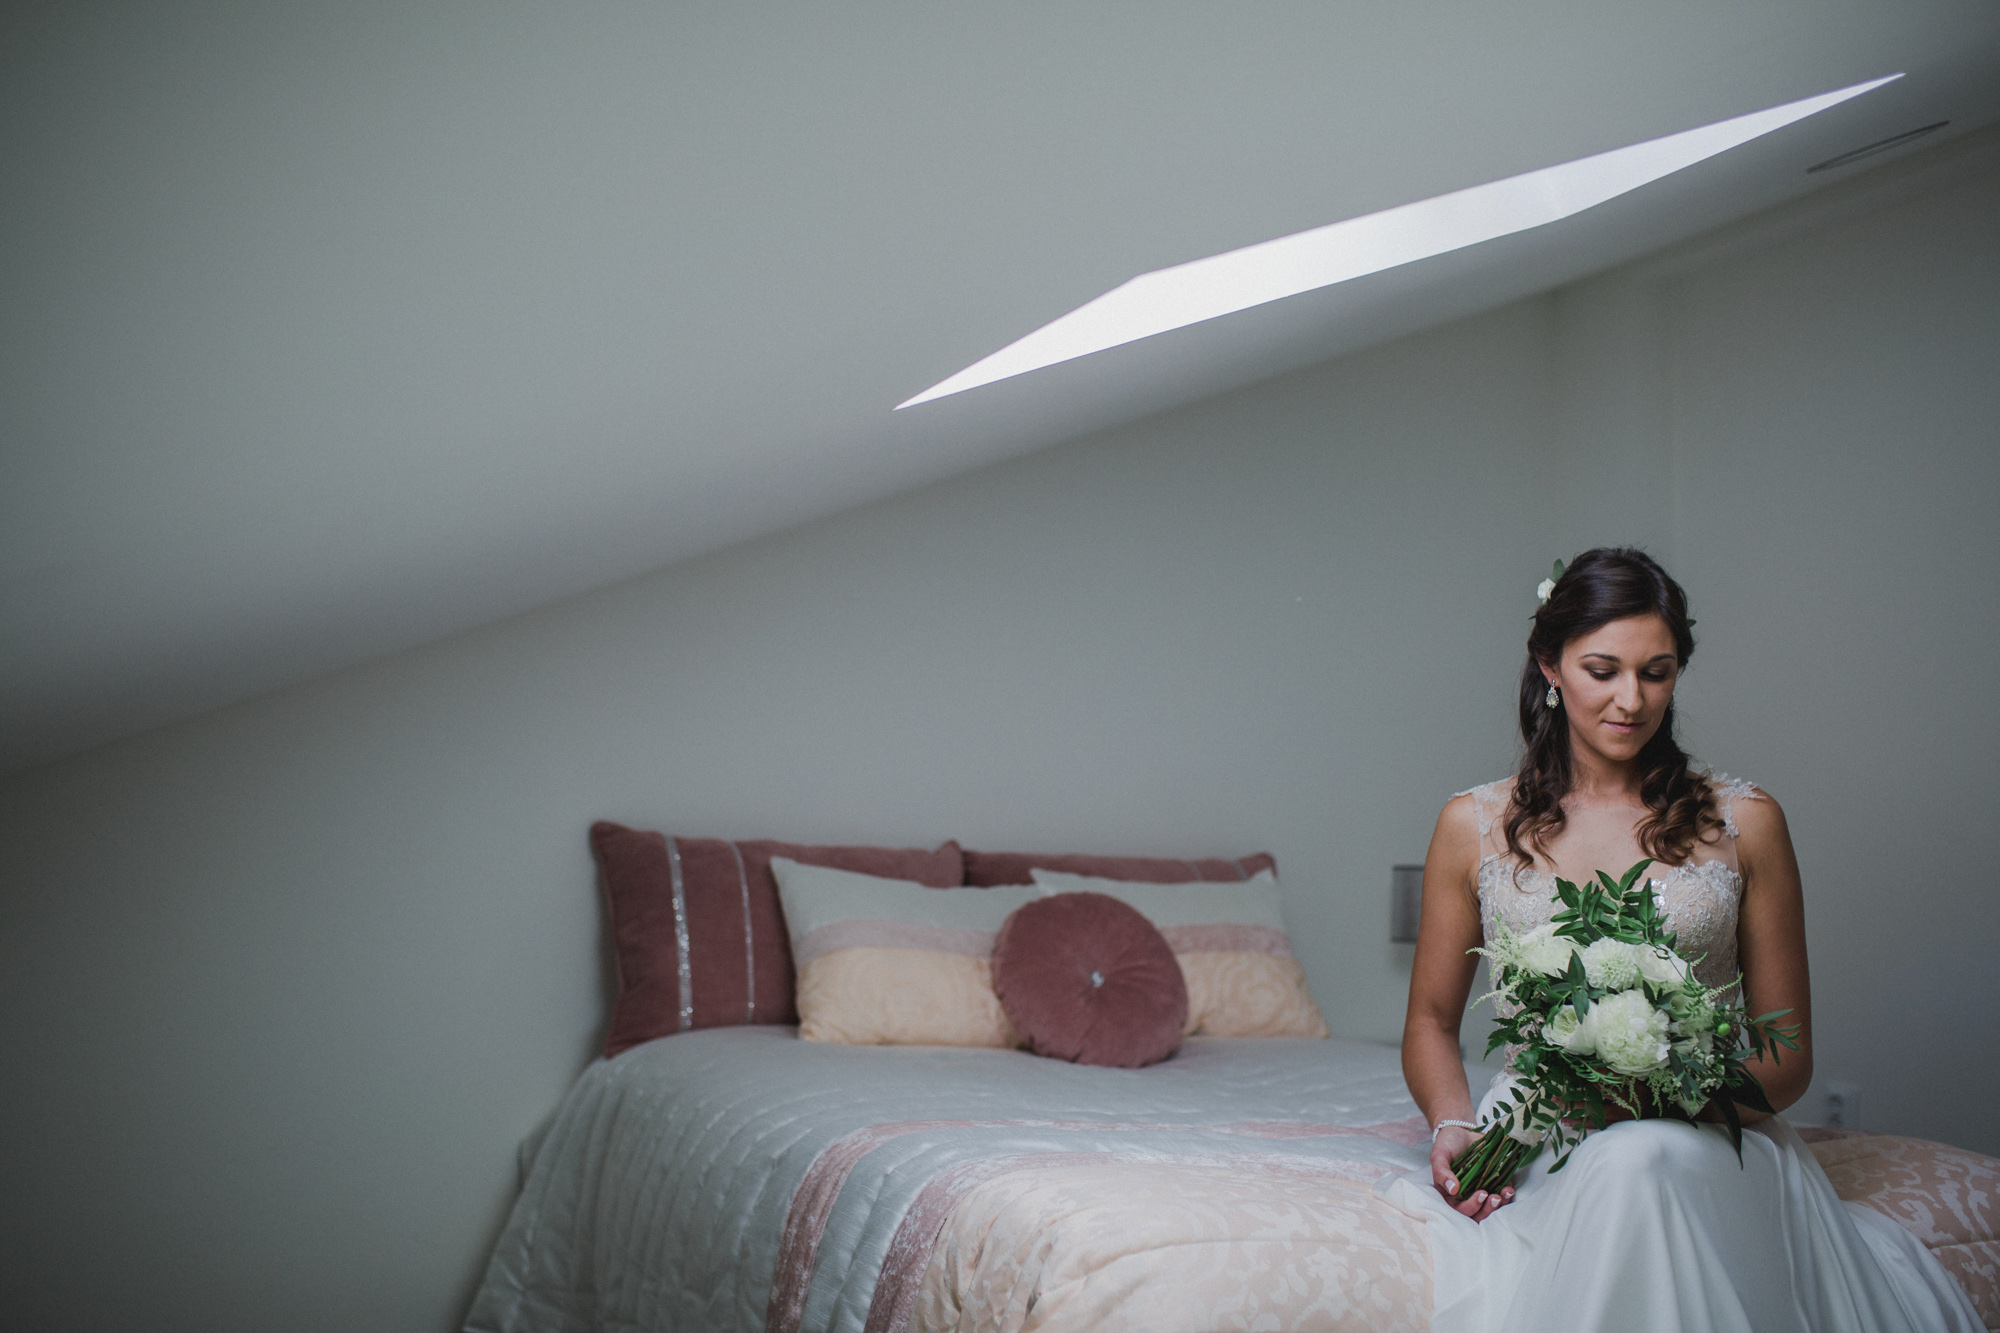 076-carina-e-samuel-wedding-casamento-quinta-dos-rouxinois-rustico-my-fancy-wedding-mafra-malveira-lisboa-sintra-cascais-filipe-santiago-fotografia-fotografo-lifestyle-destination-portugal